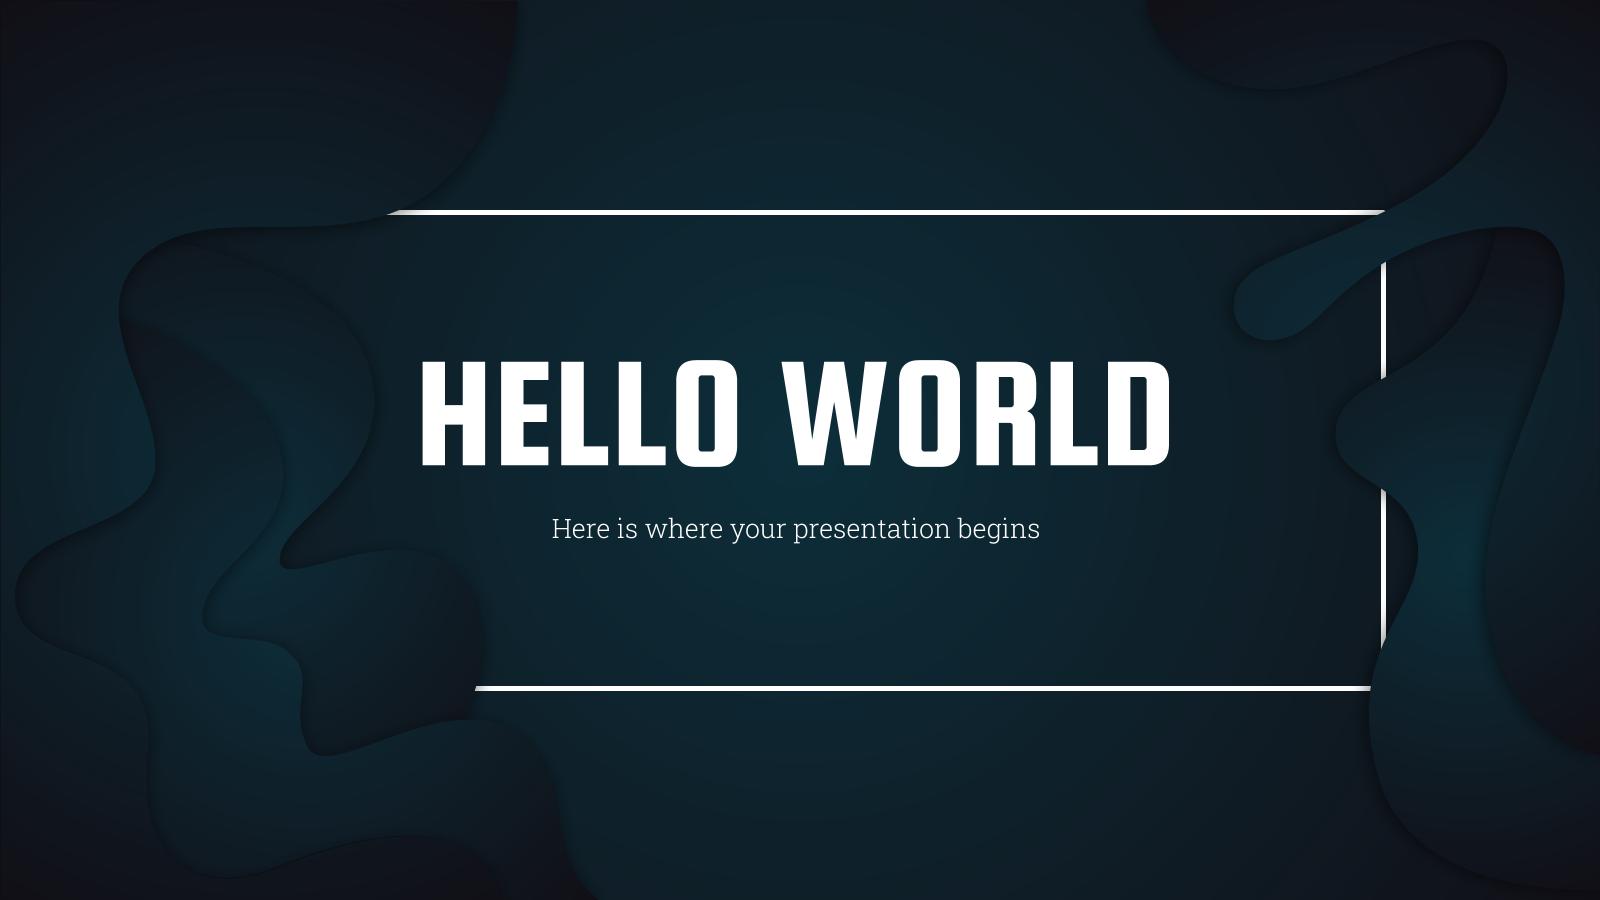 Plantilla de presentación Startup inspiradora de color negro